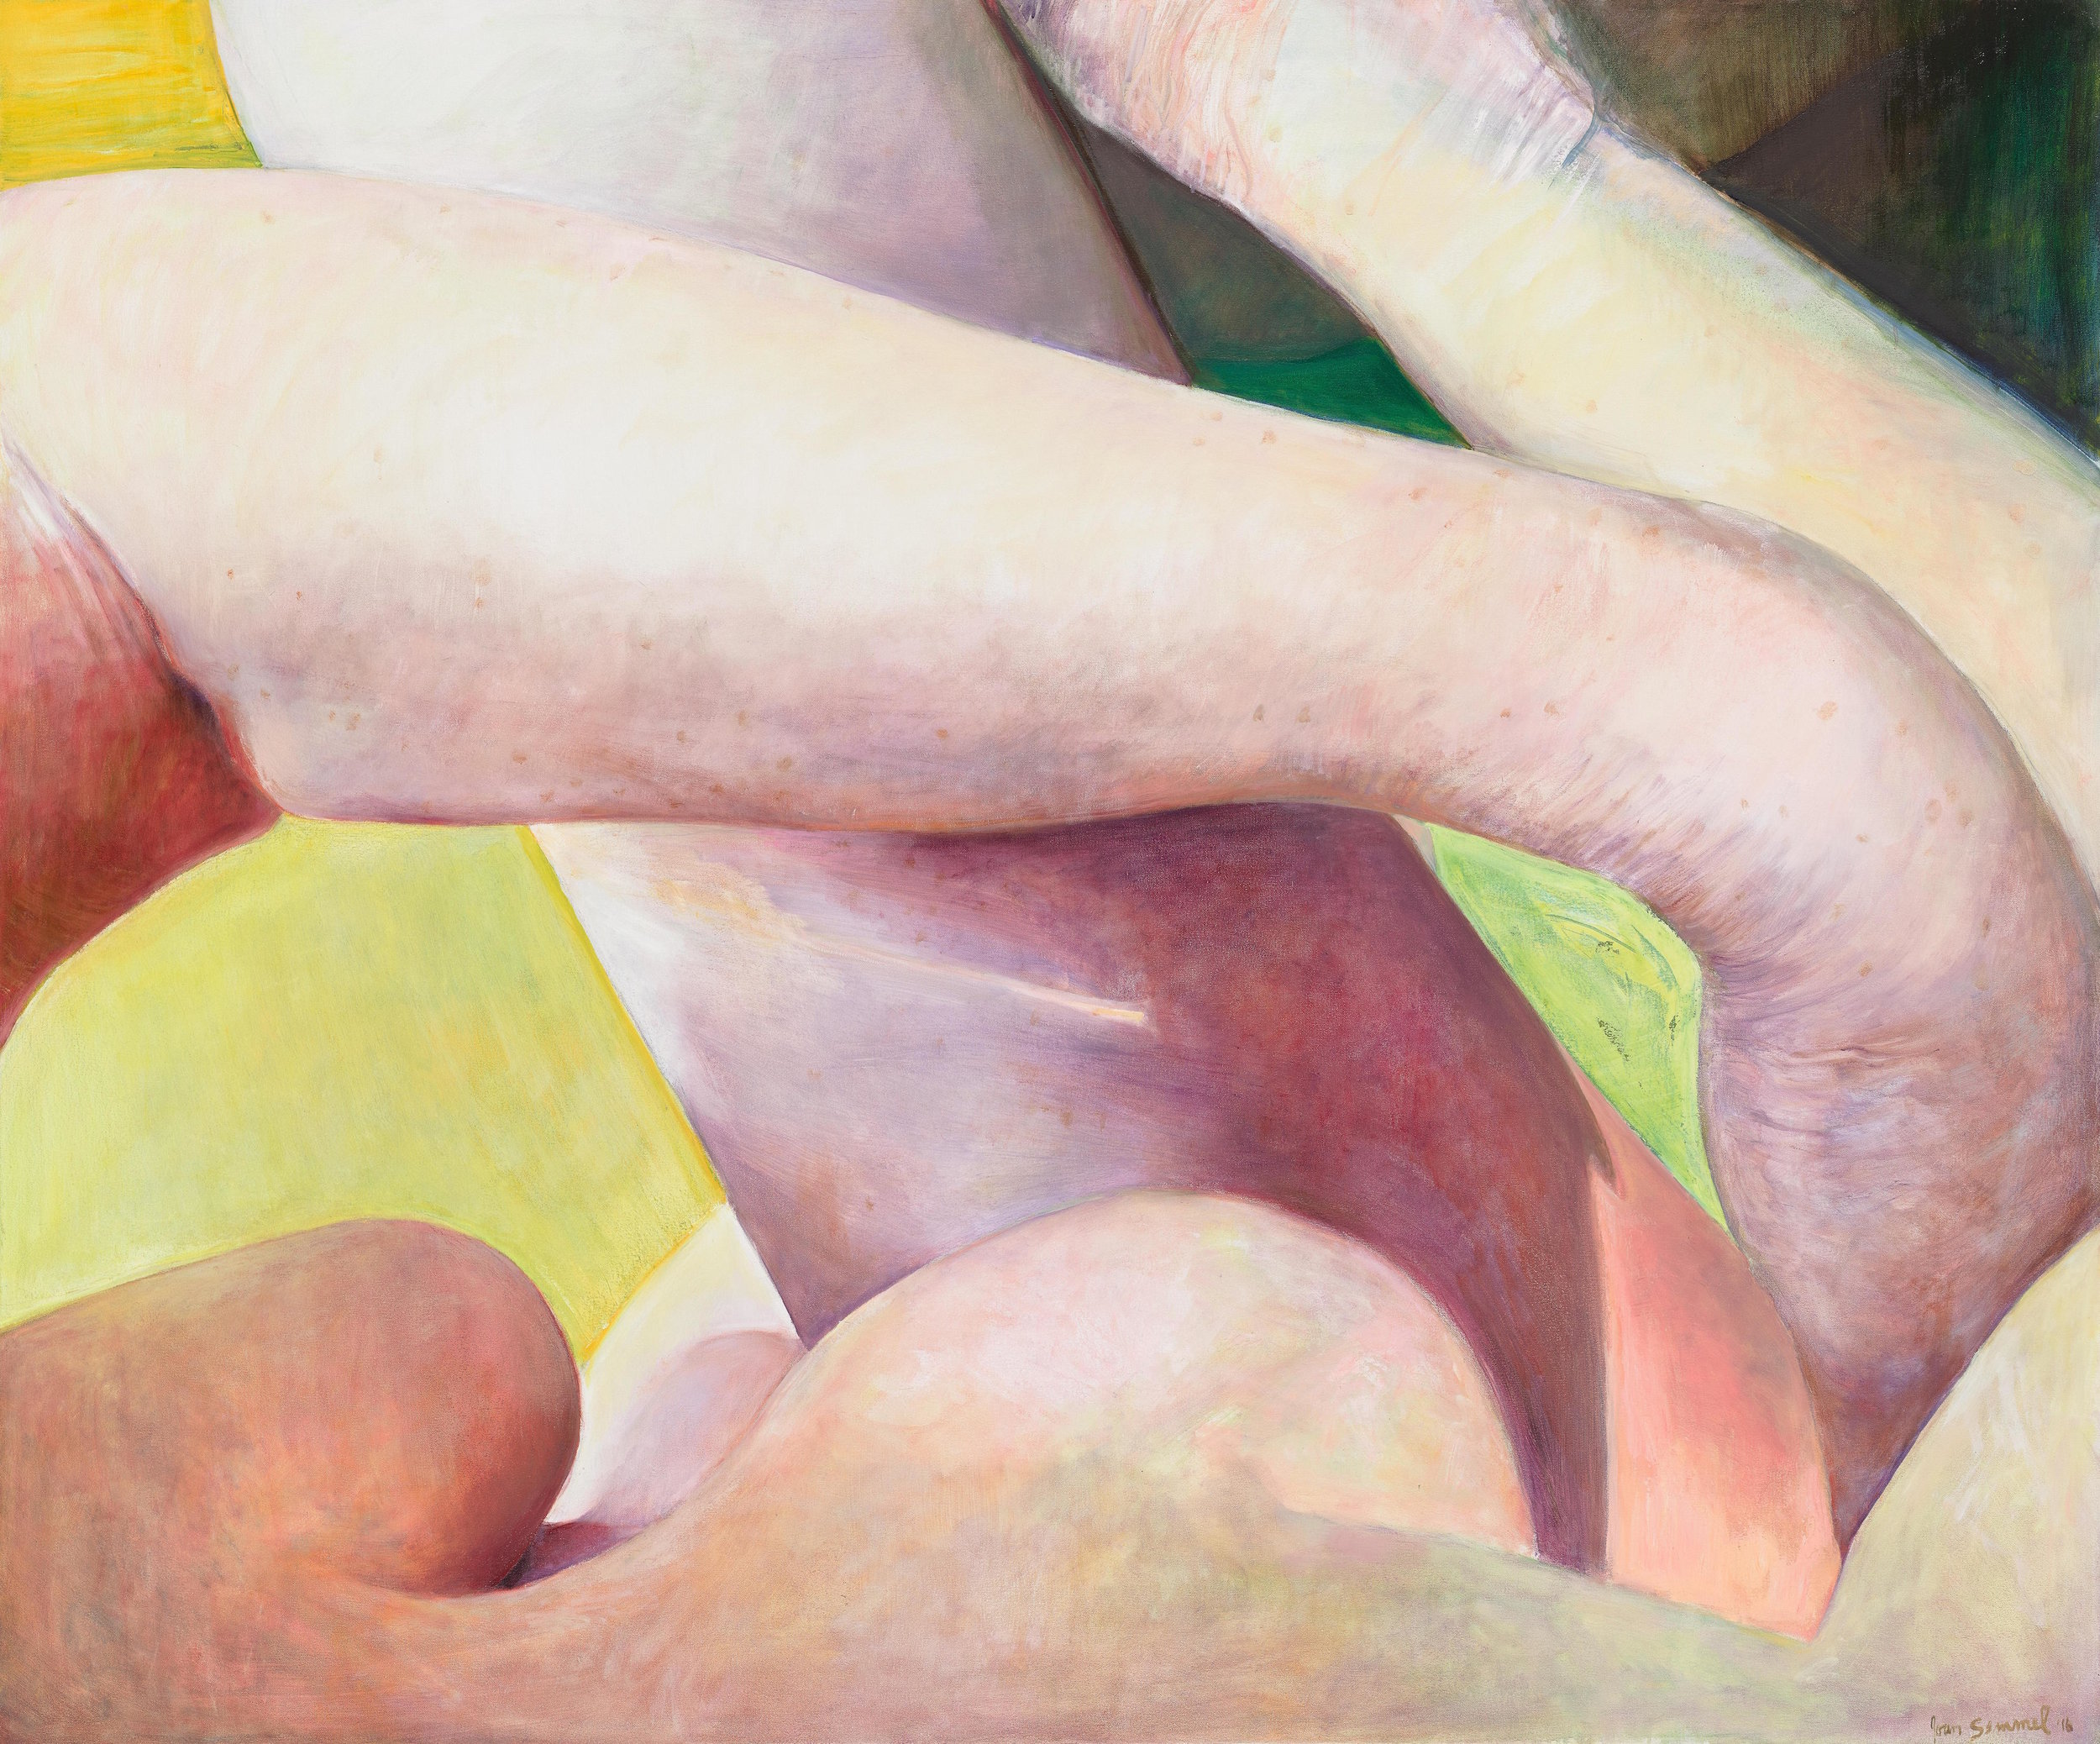 Joan Semmel, Crossed Limbs, 2016, Oil on canvas, 60 x 72 in, (152.4h x 182.88w cm) Courtesy Alexander Gray Associates, New York © 2016 Joan Semmel/Artists Rights Society (ARS), New York